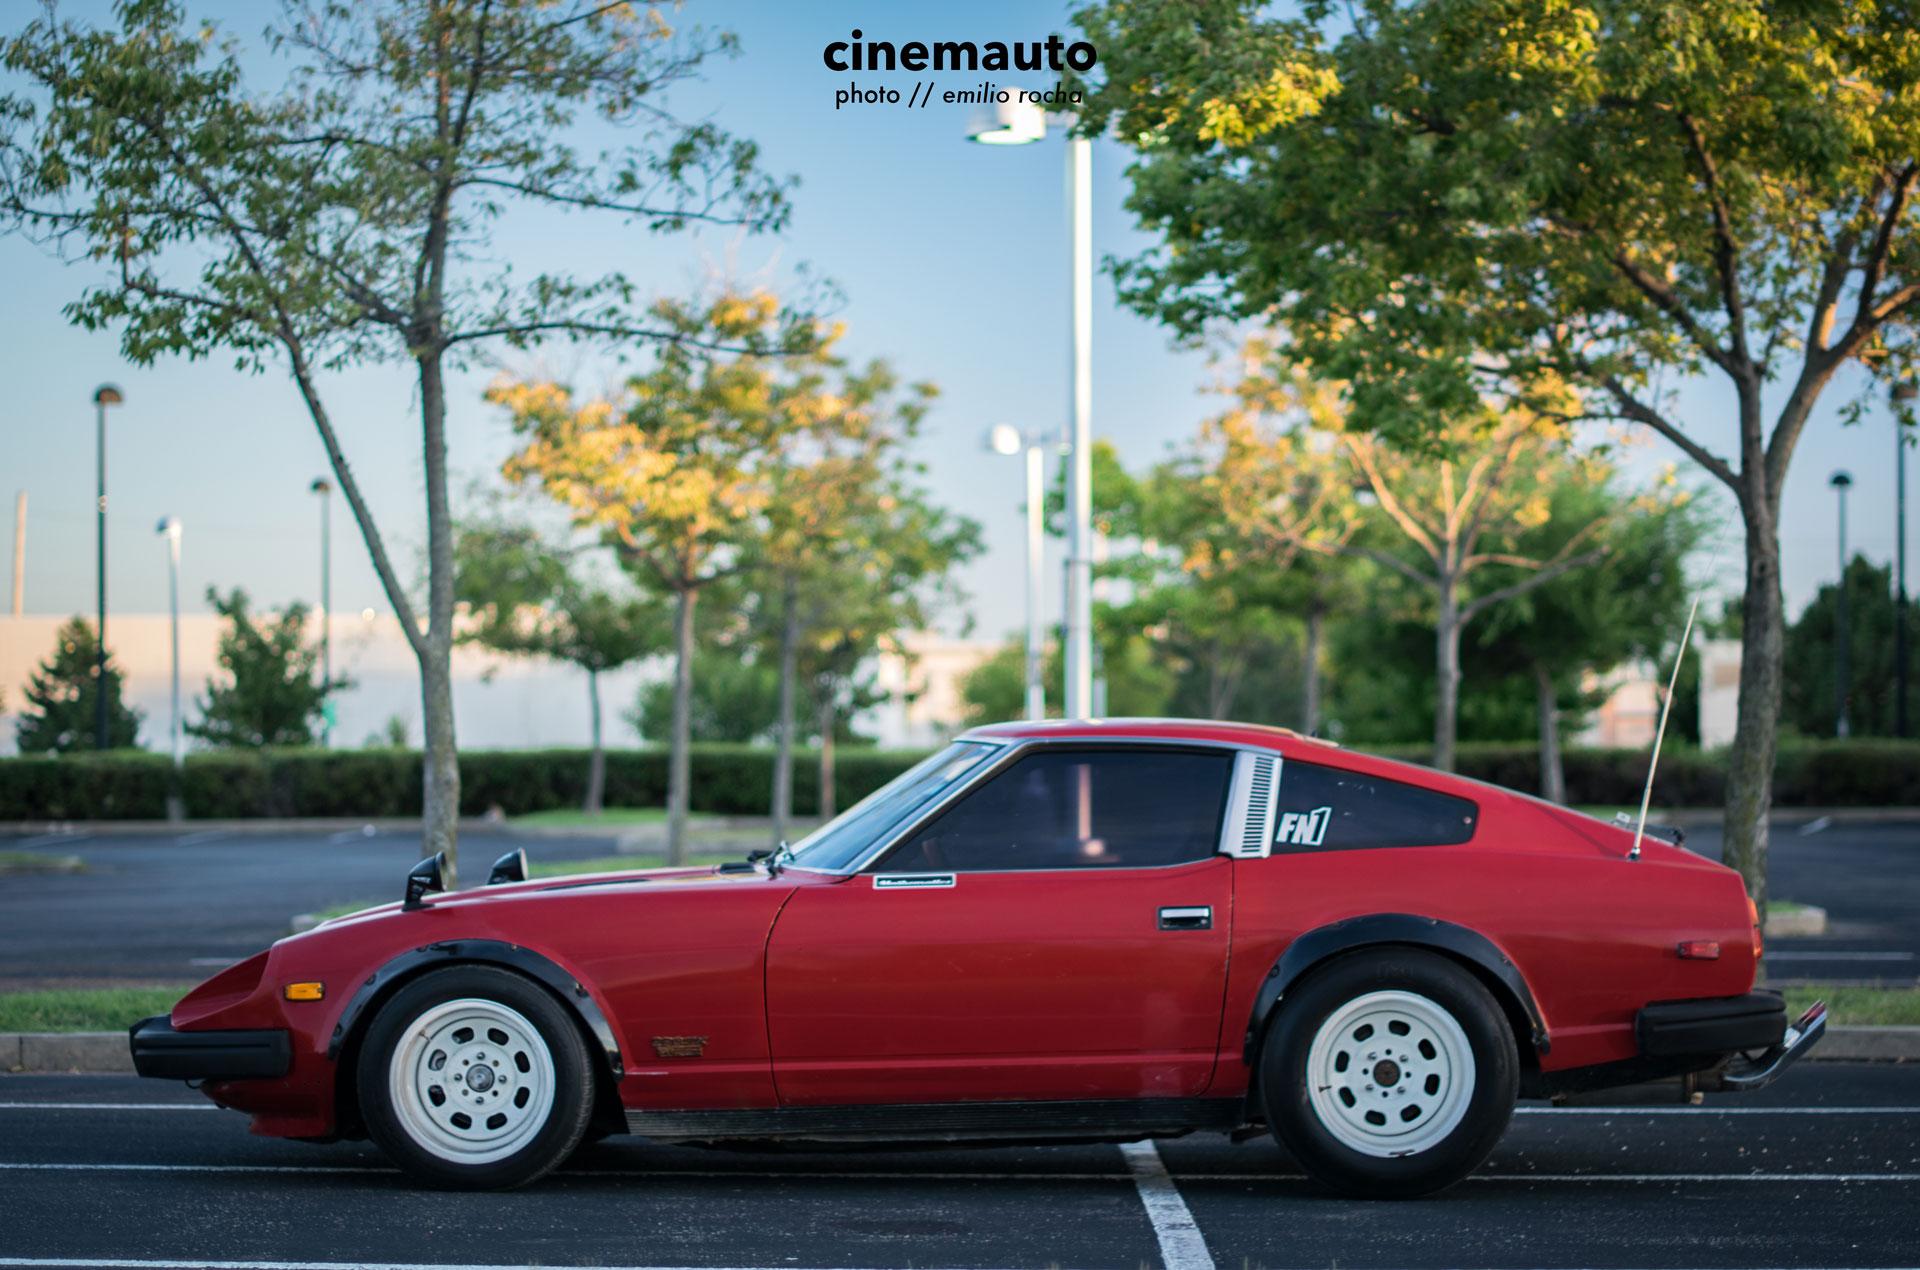 cinemauto-kansas-automotive-photography-datsun22.jpg